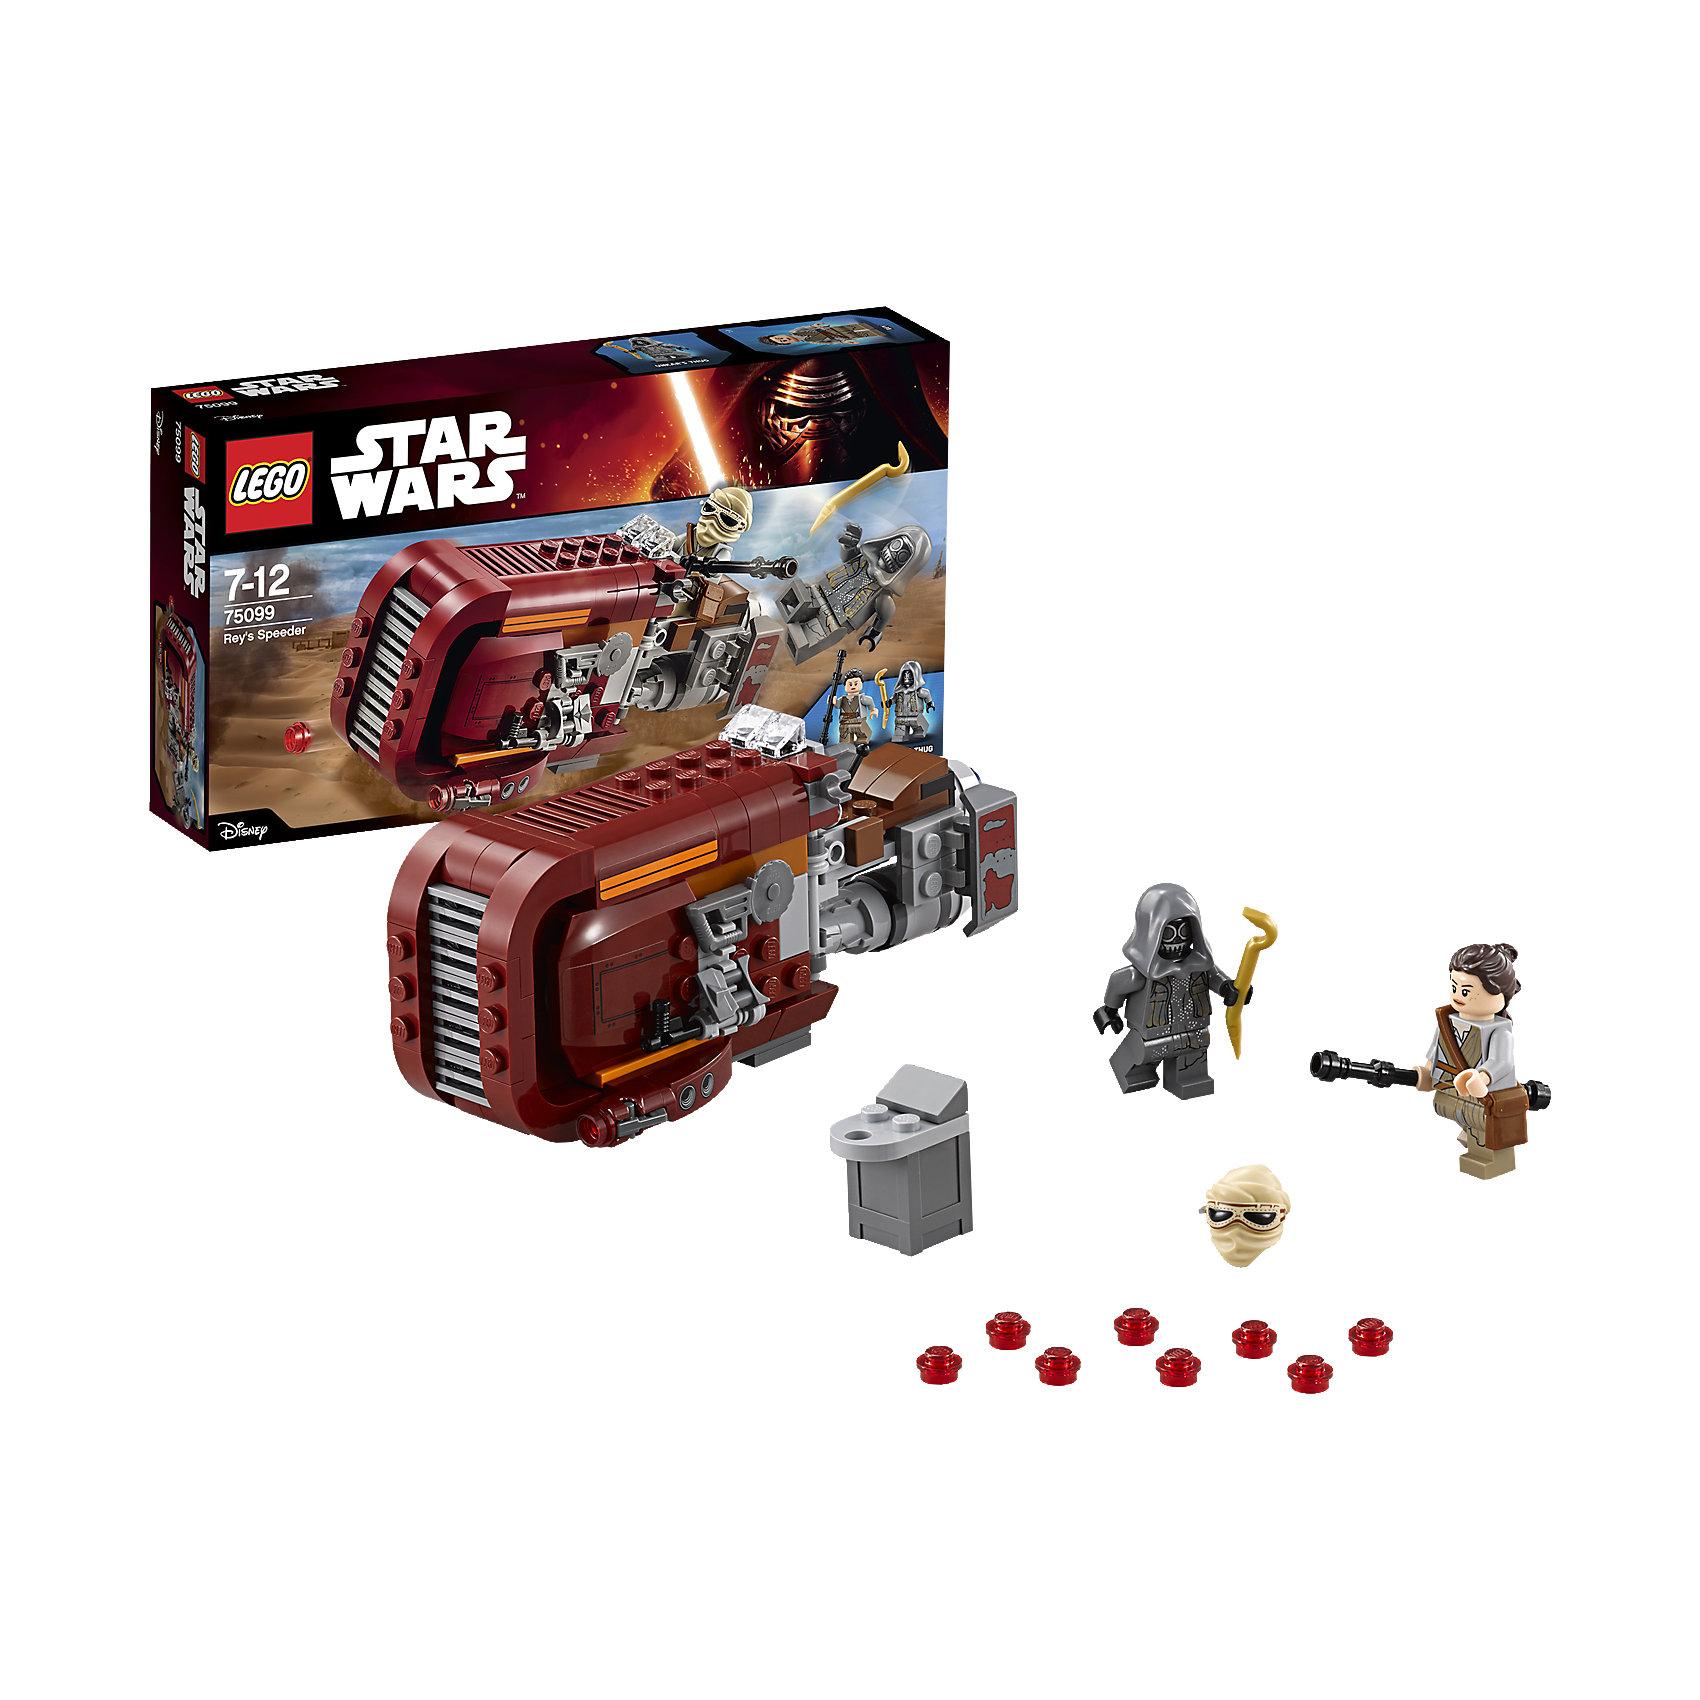 LEGO LEGO Star Wars 75099: Спидер Рей секатор raco 4206 53 143s